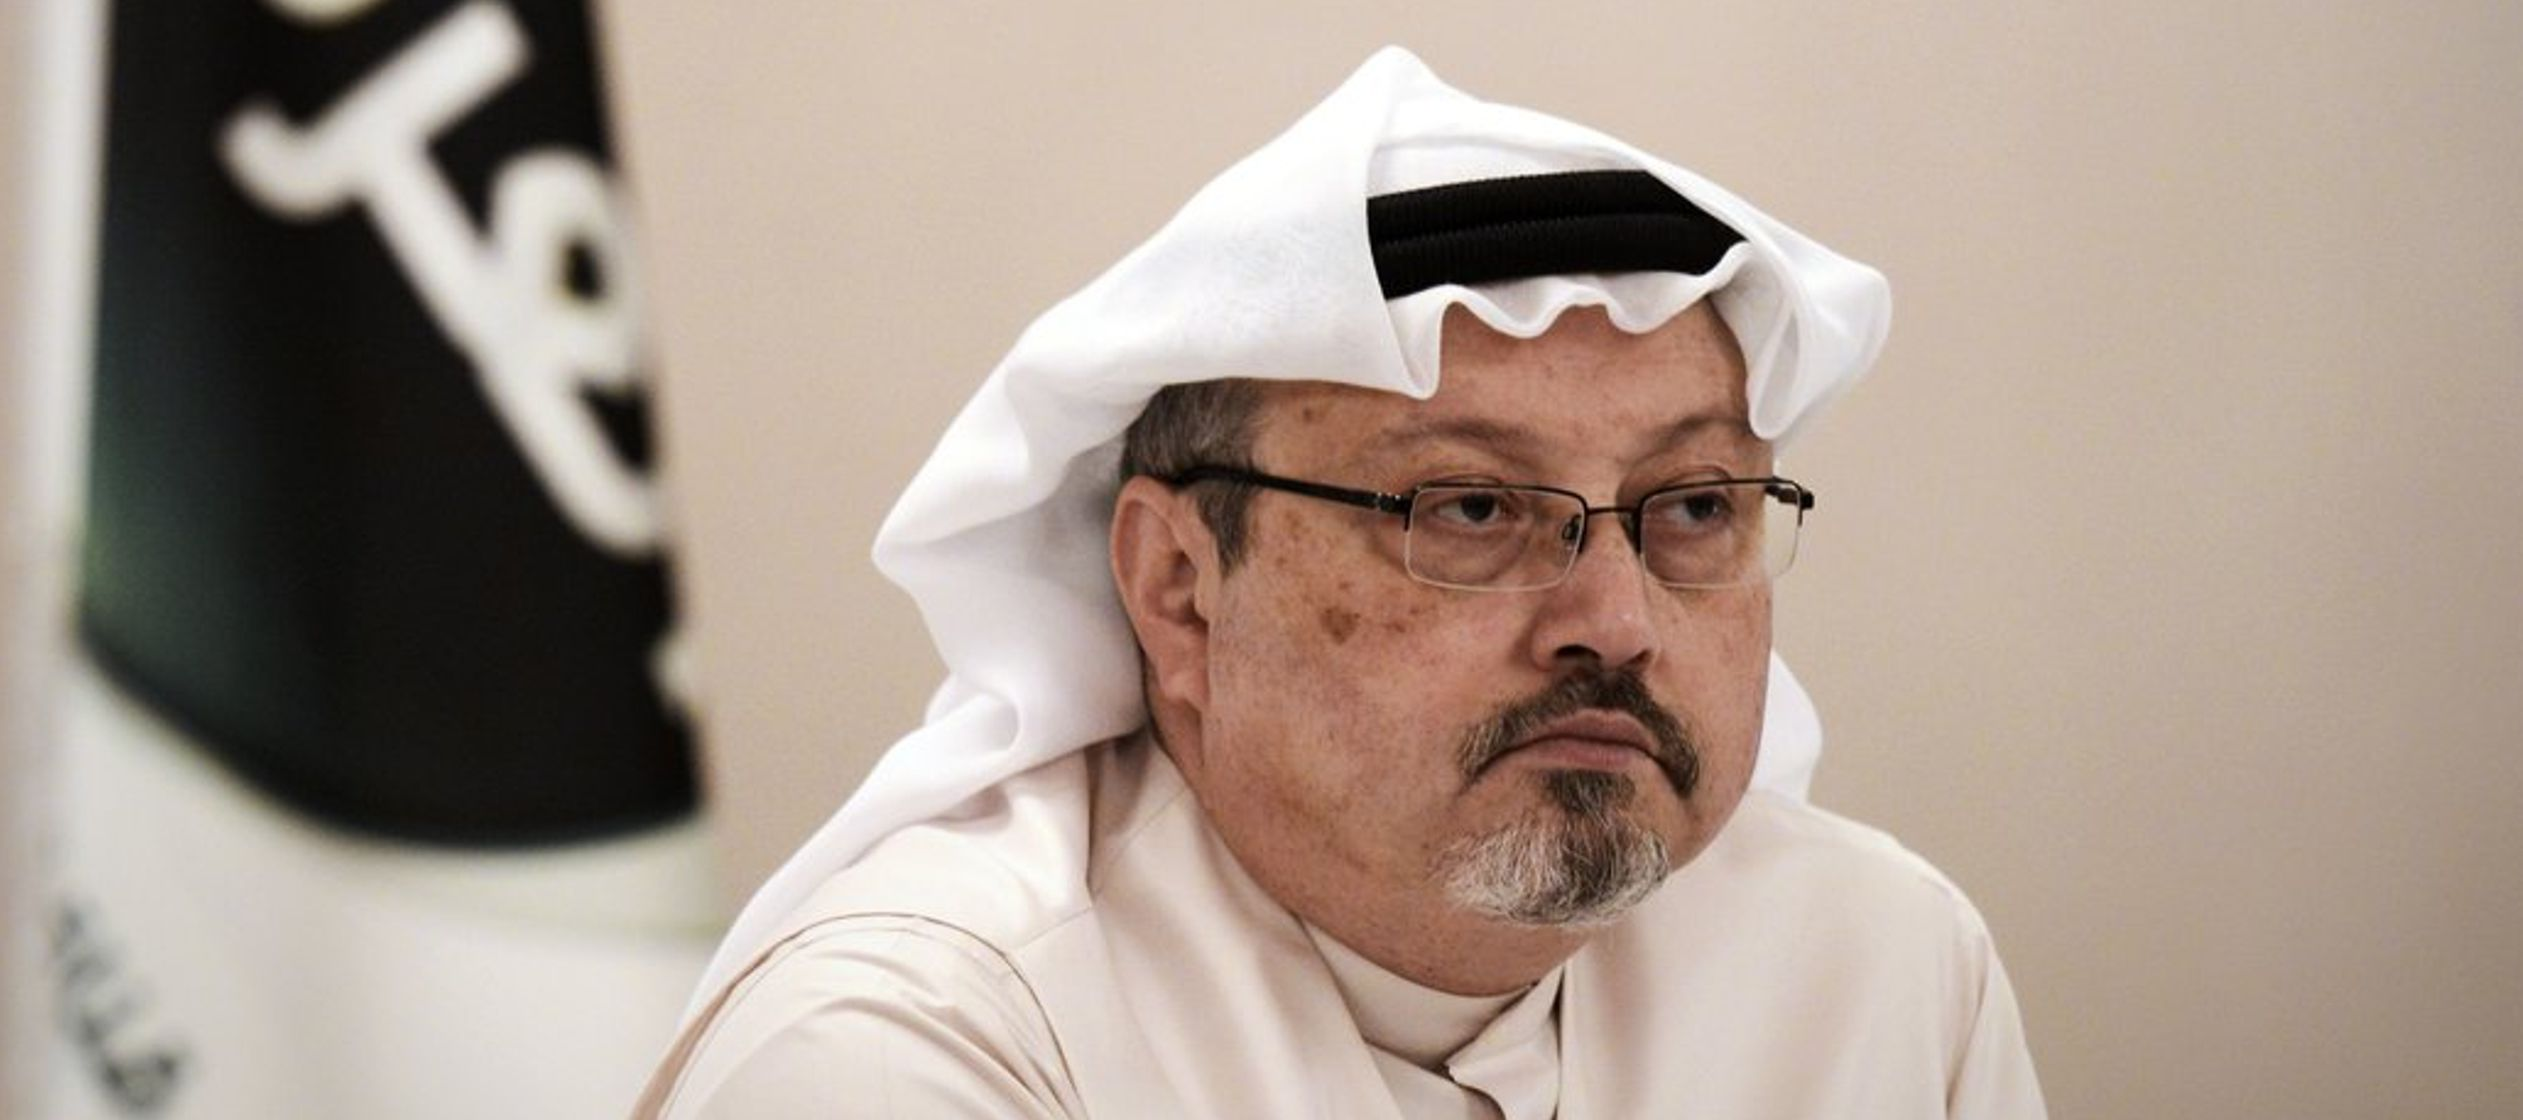 Arabia Saudita confirma la muerte de Jamal Khashoggi